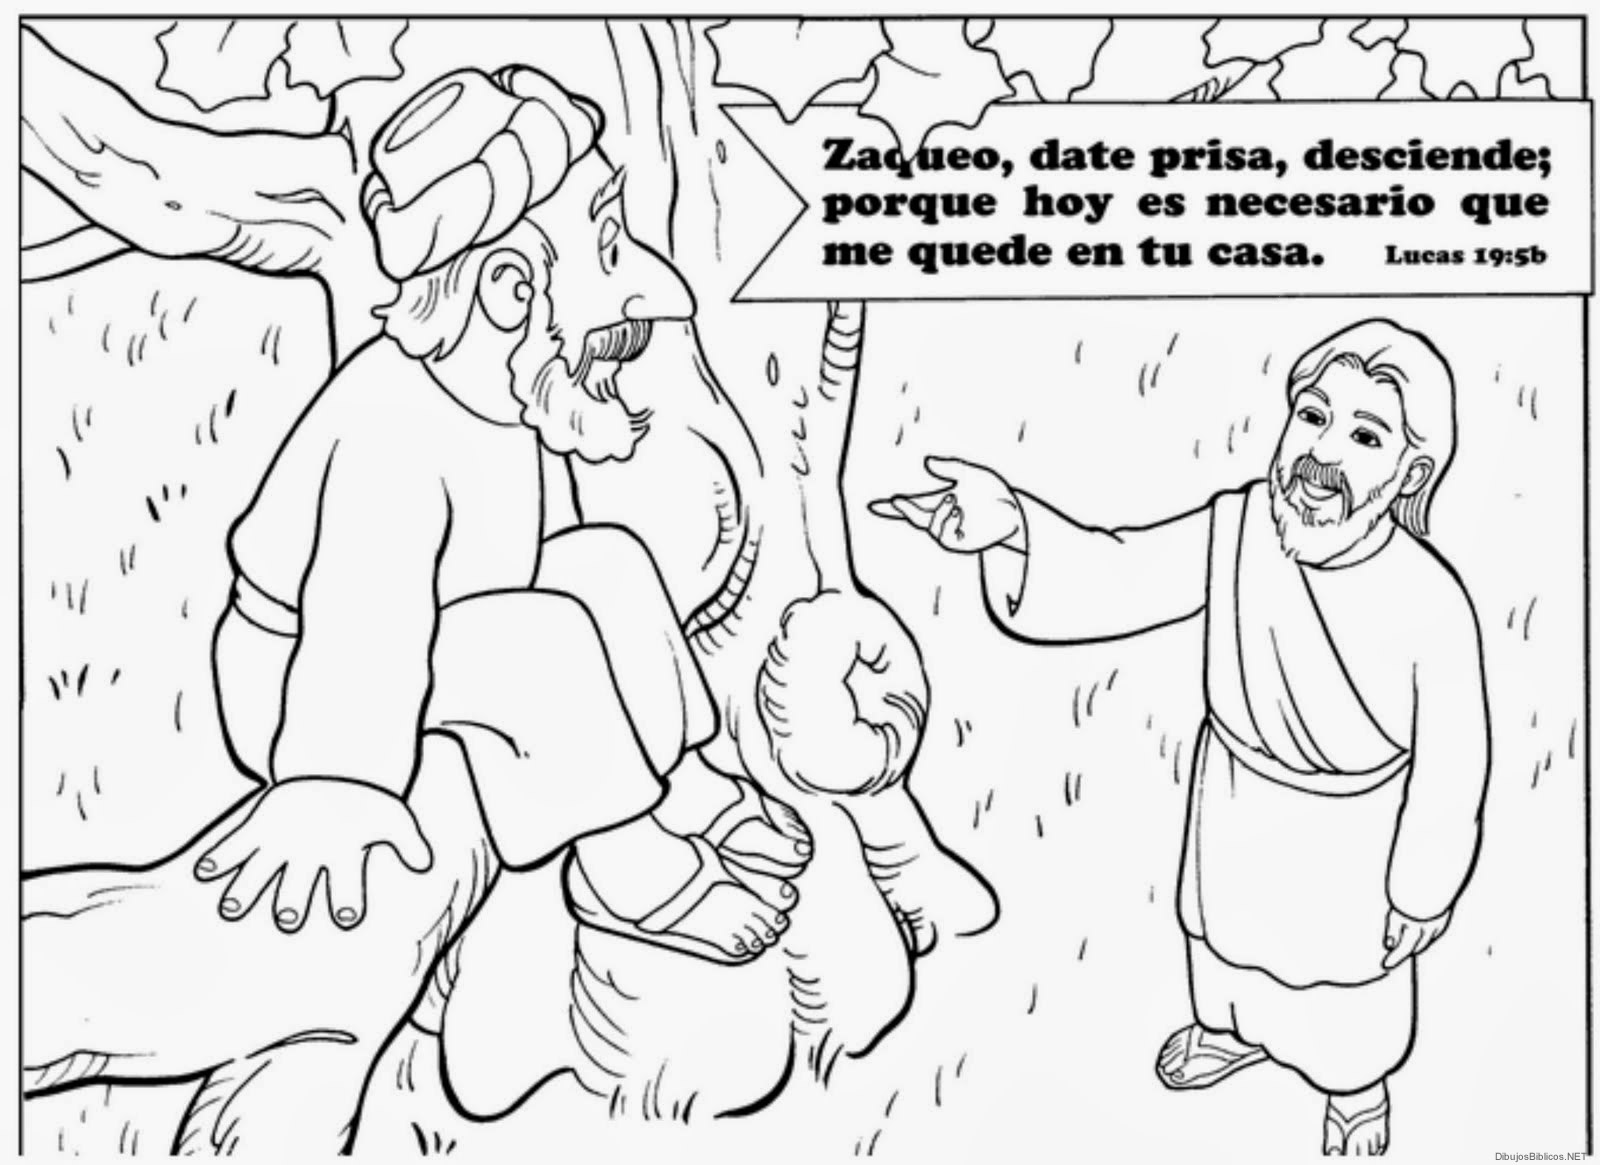 Dibujos_Para_Colorear_De_Zaqueo15.jpg